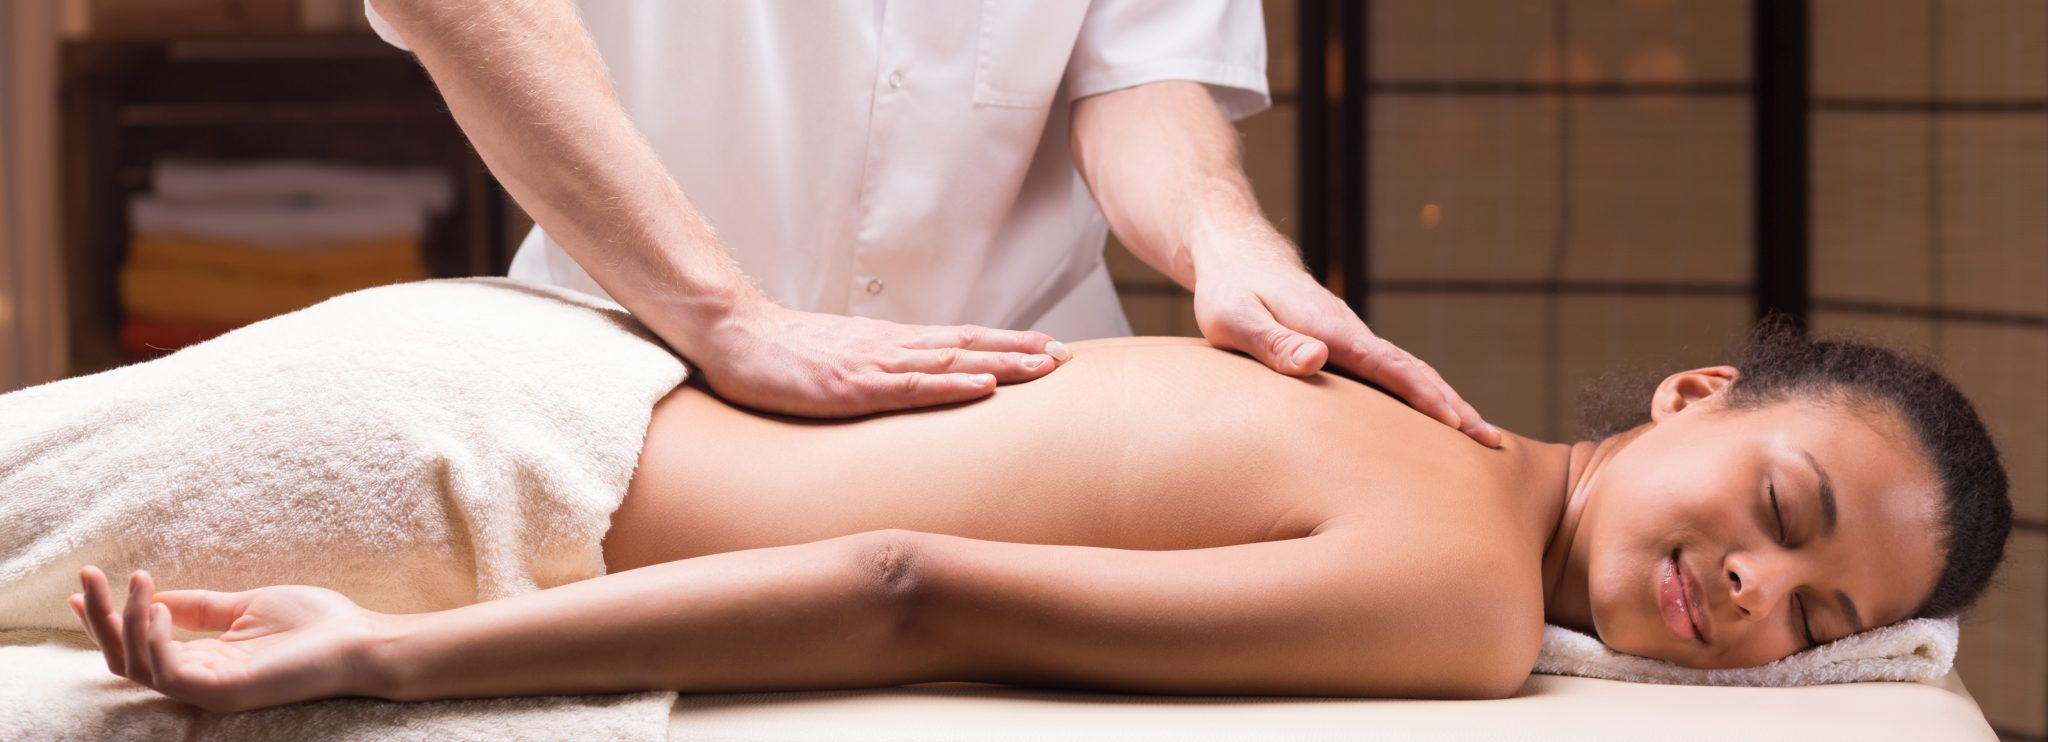 masajes, fisioterapia